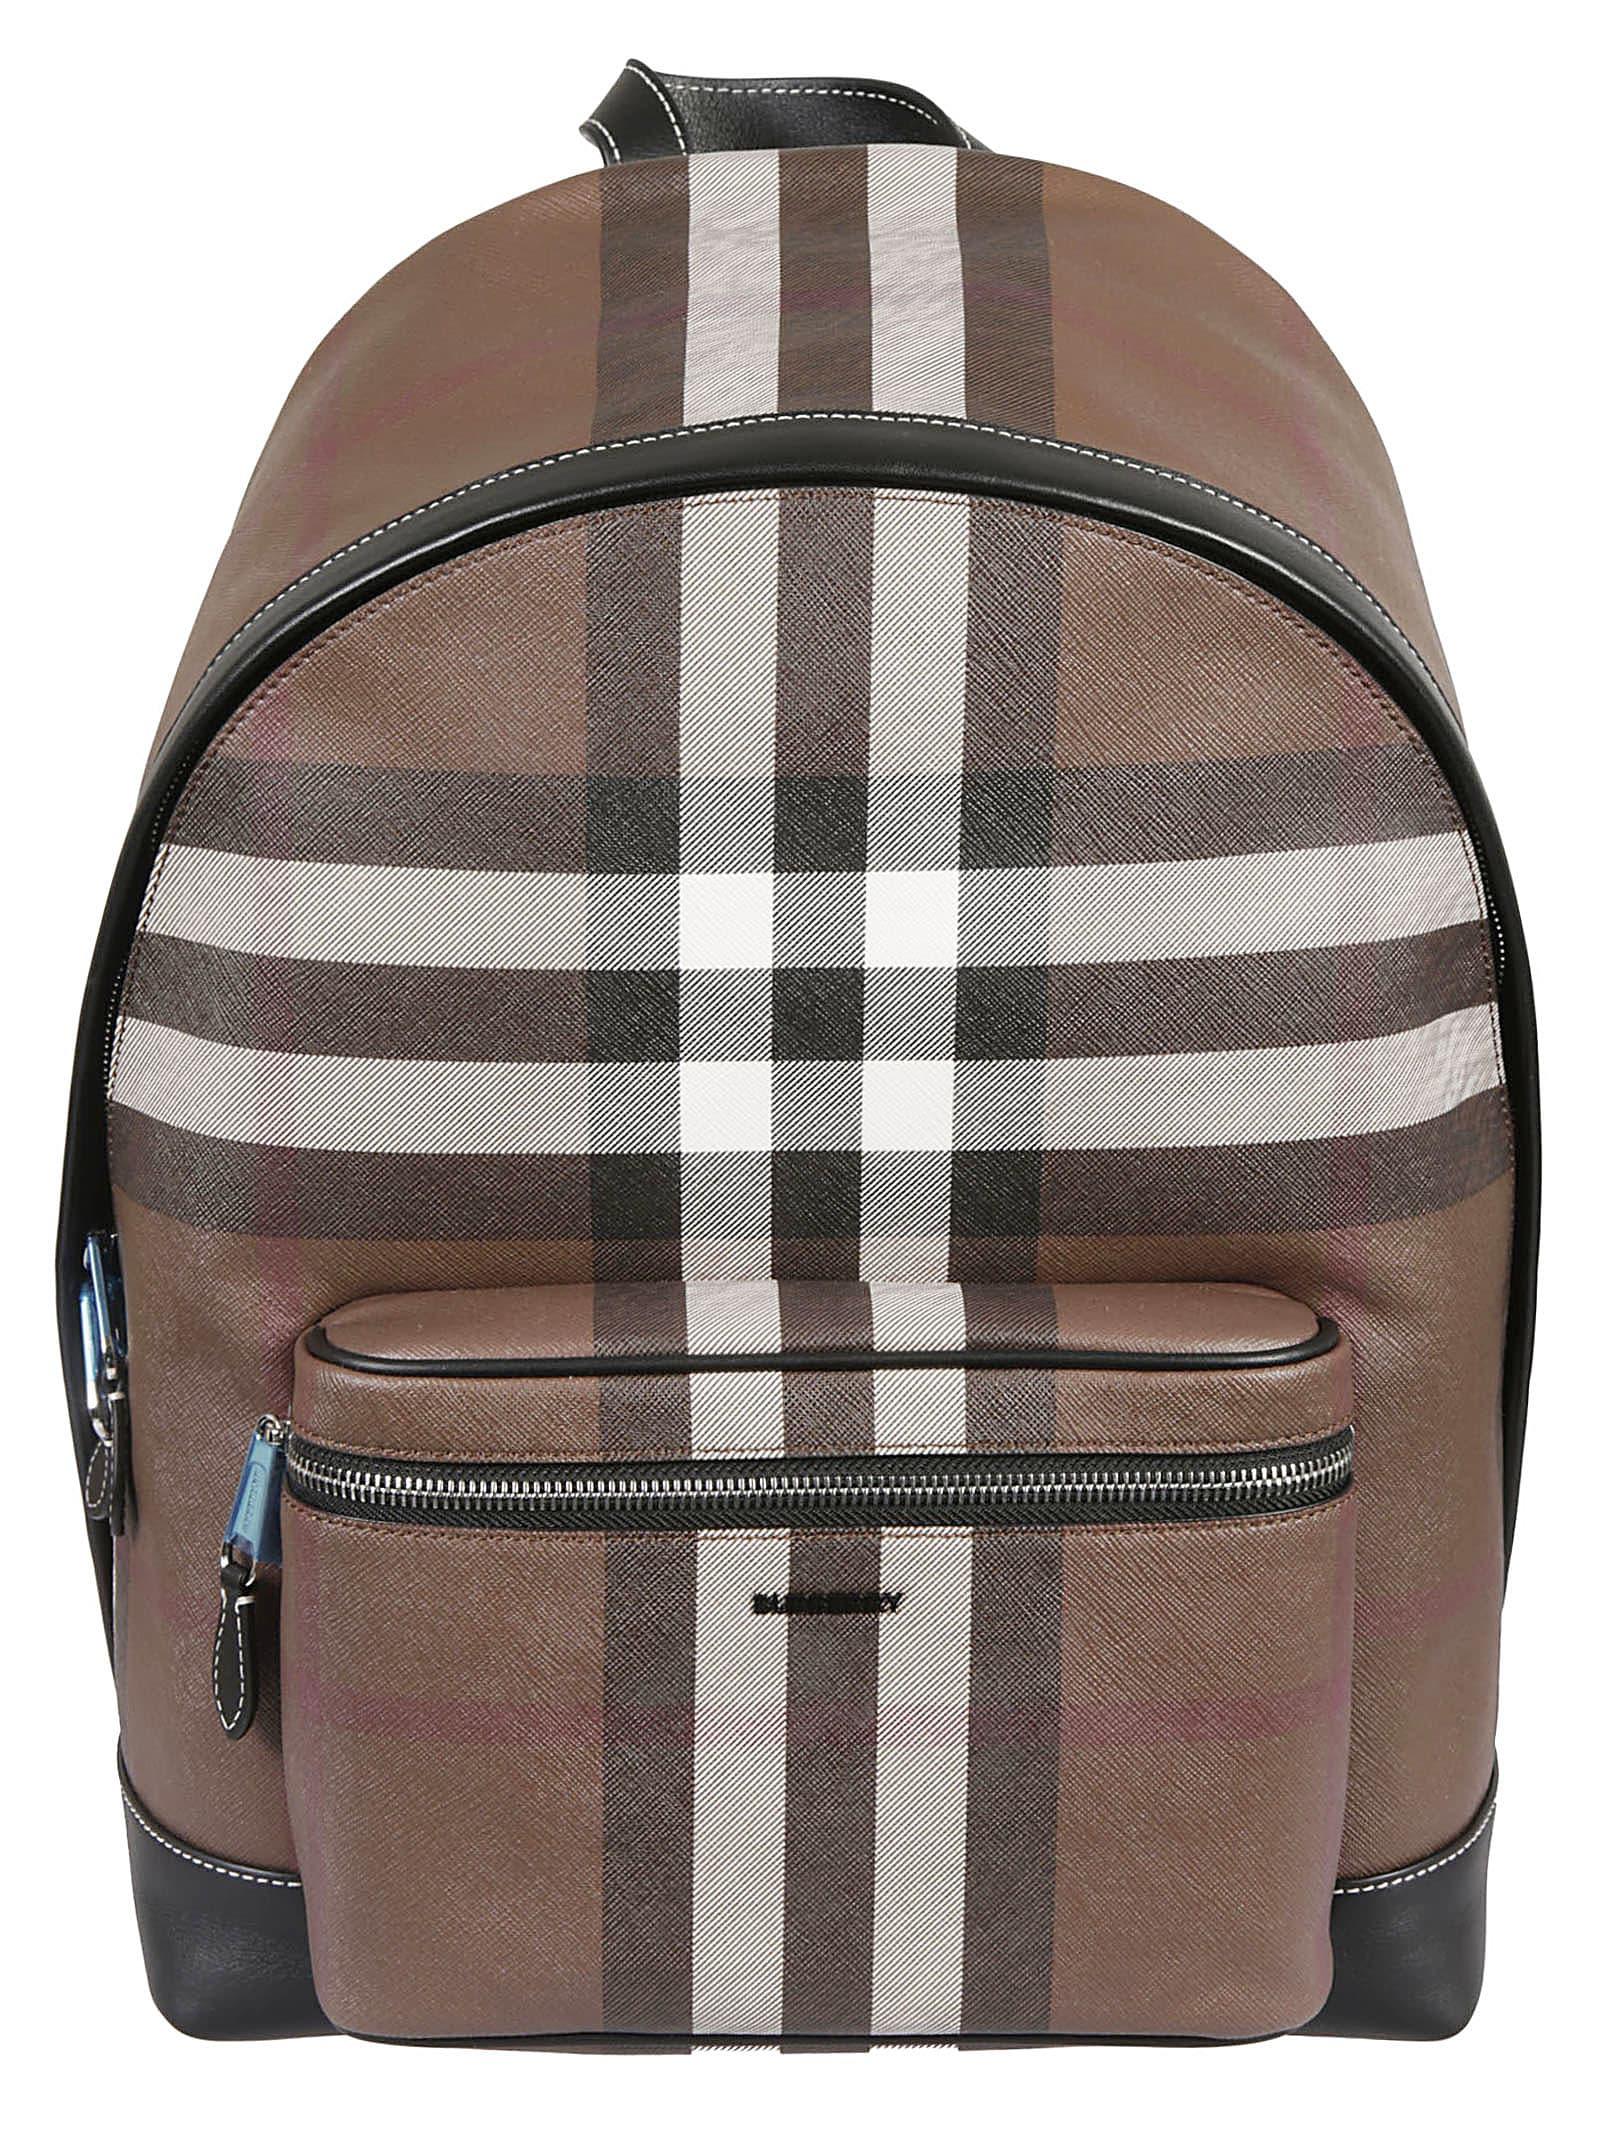 Burberry Jett Backpack In Dark Birch Brown